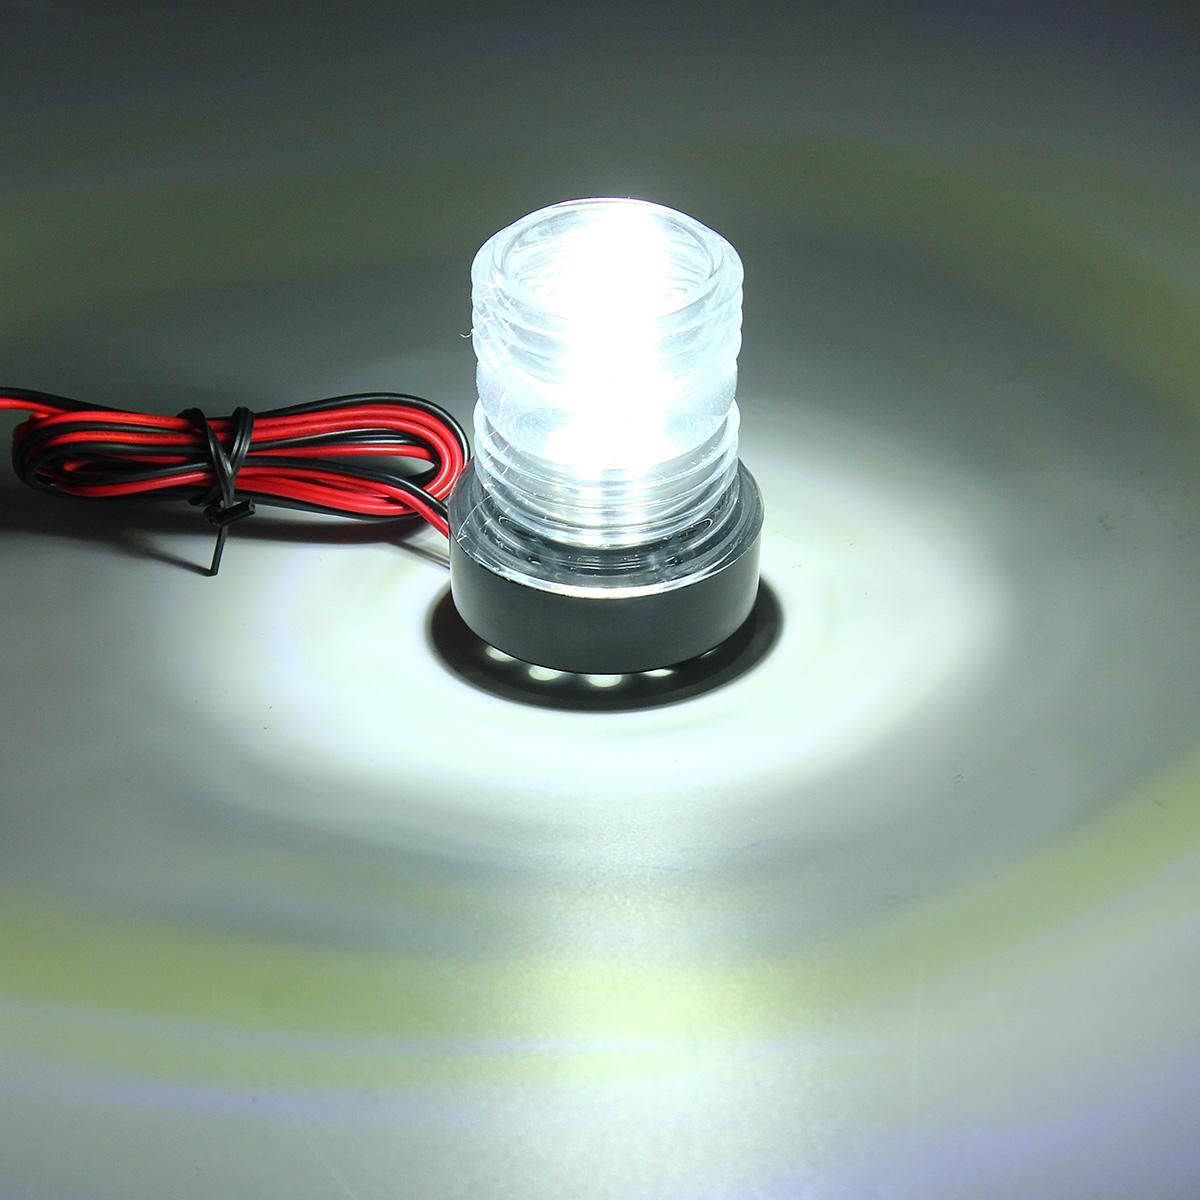 Boot Navigationslicht Positionslicht Signalleuchte 12V Navigation Lampe